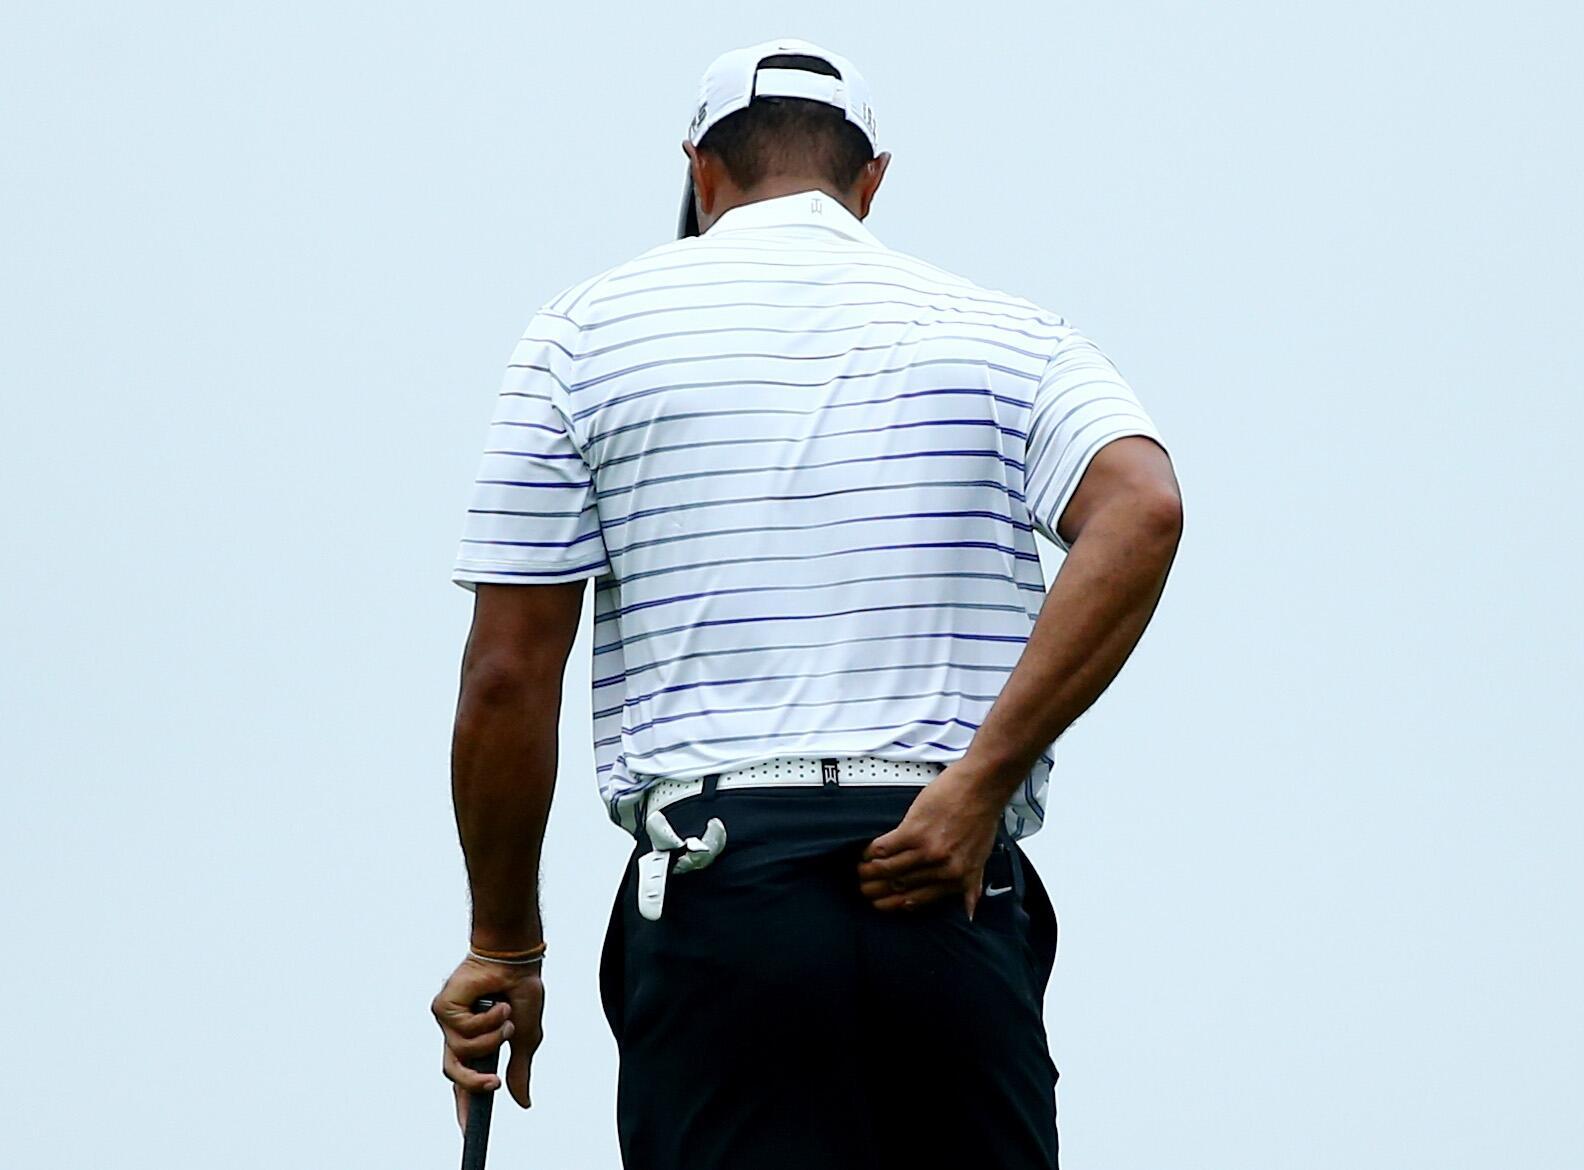 Bild zu Tiger Woods, PGA, Valhalla Golf Club, Louisville, Kentucky, USA, 2014, Rücken, Schmerzen